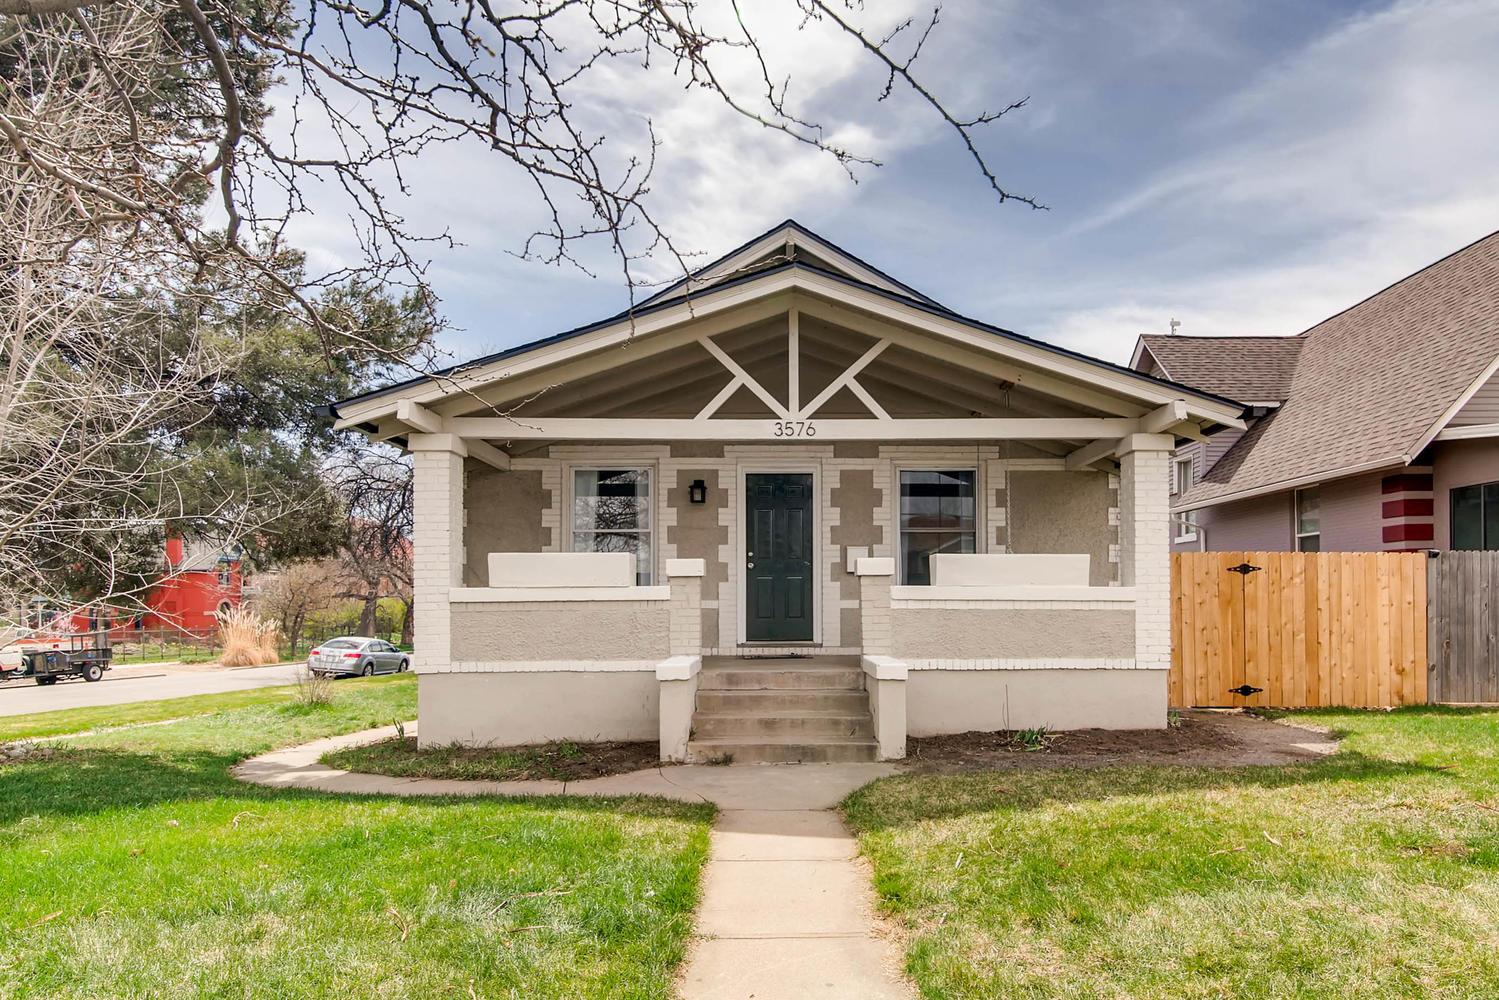 3576 Bruce Randolph Ave Denver-large-001-5-Exterior FrontEdit-1500x1000-72dpi.jpg